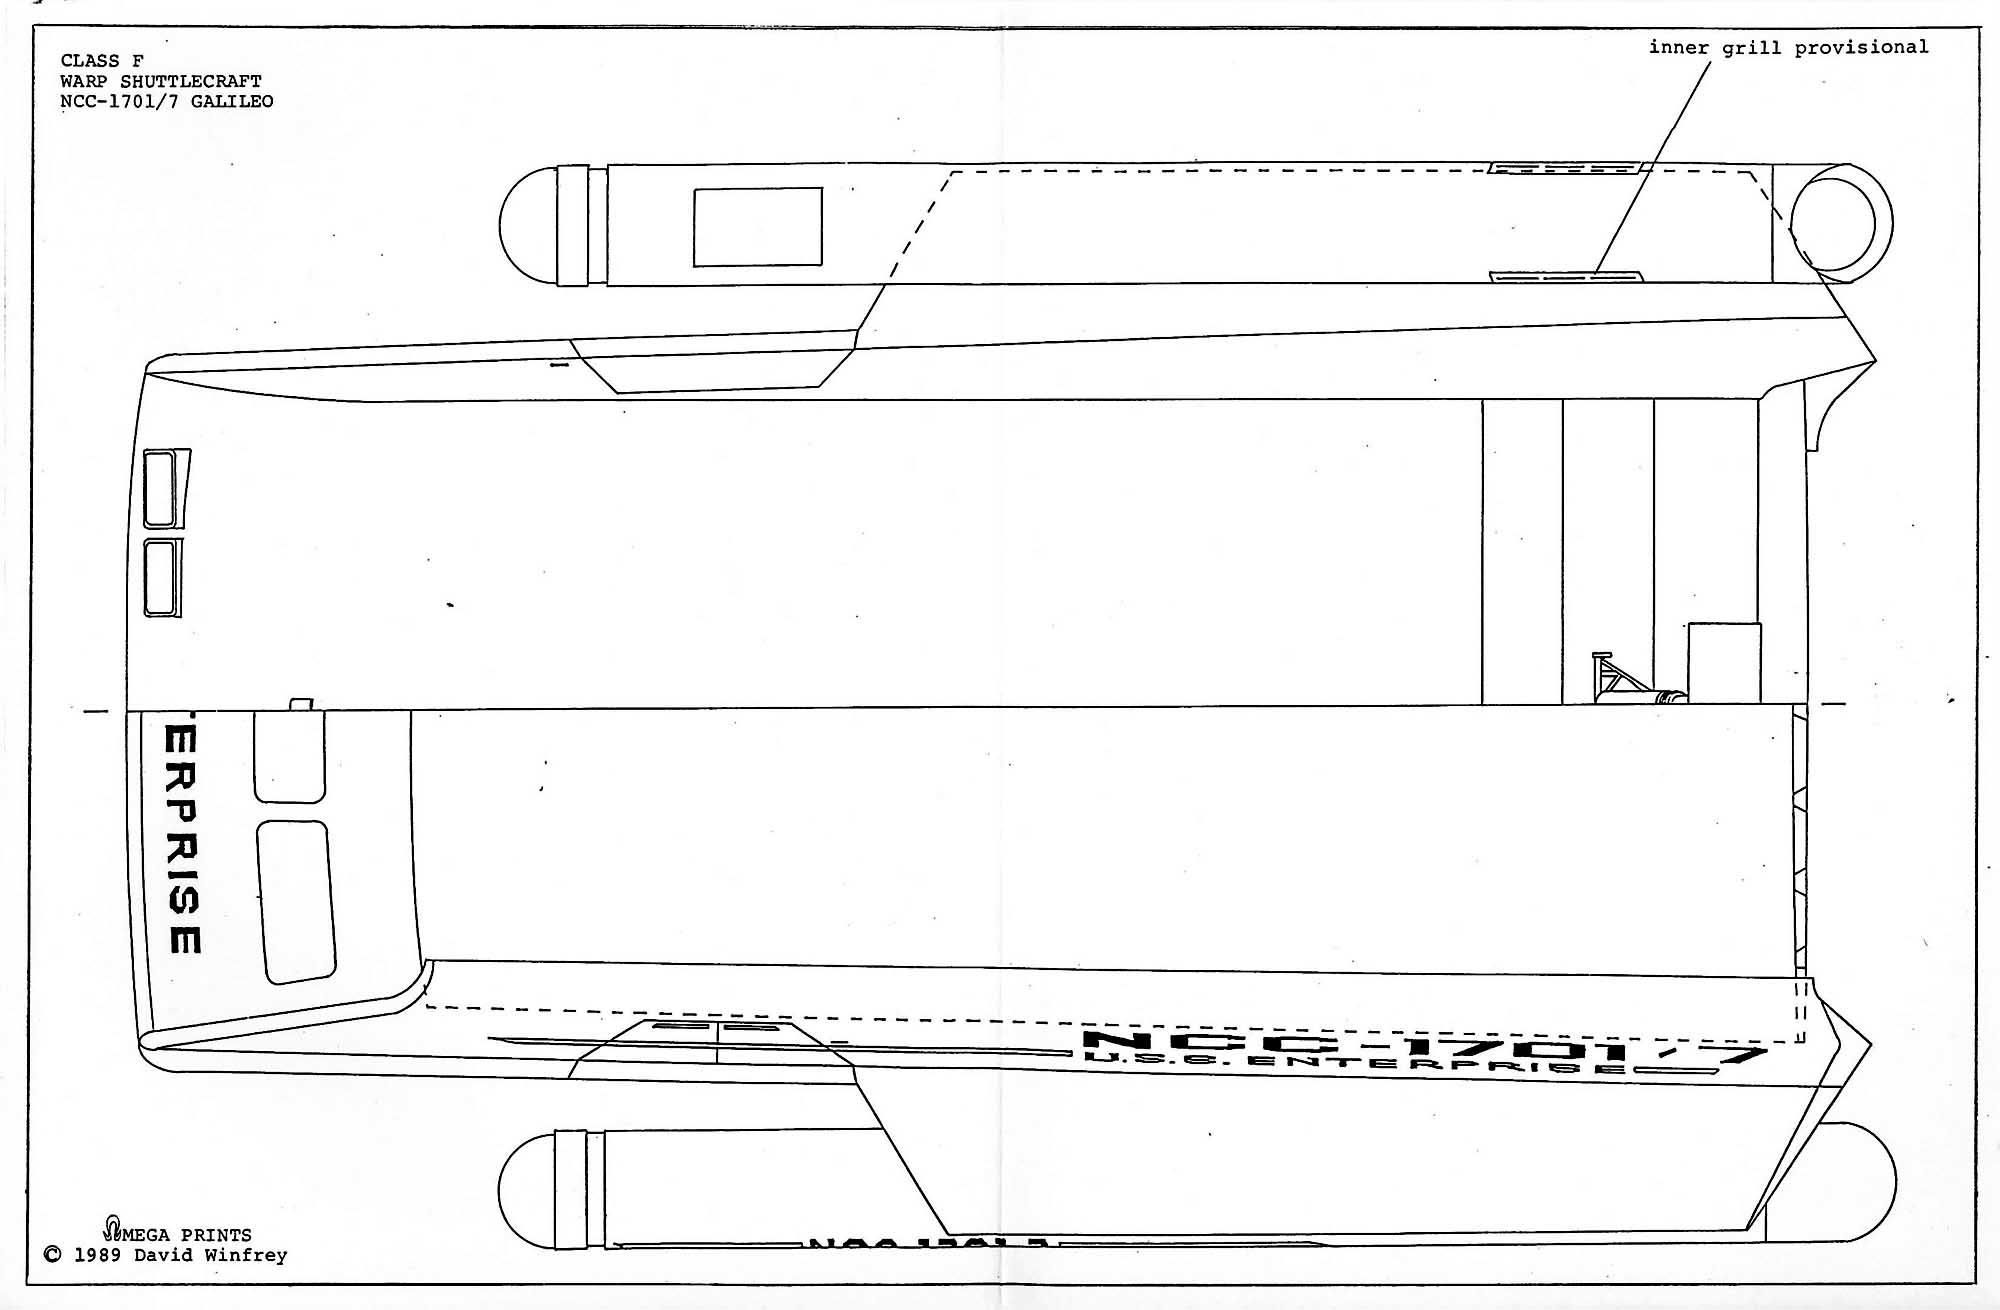 Star Trek Blueprints: Cl F Shuttlecraft Galileo II NCC-1701/7 Shuttle Craft Wiring Diagram on needle diagram, splinter diagram, altitude diagram, pioneer diagram, parking diagram,